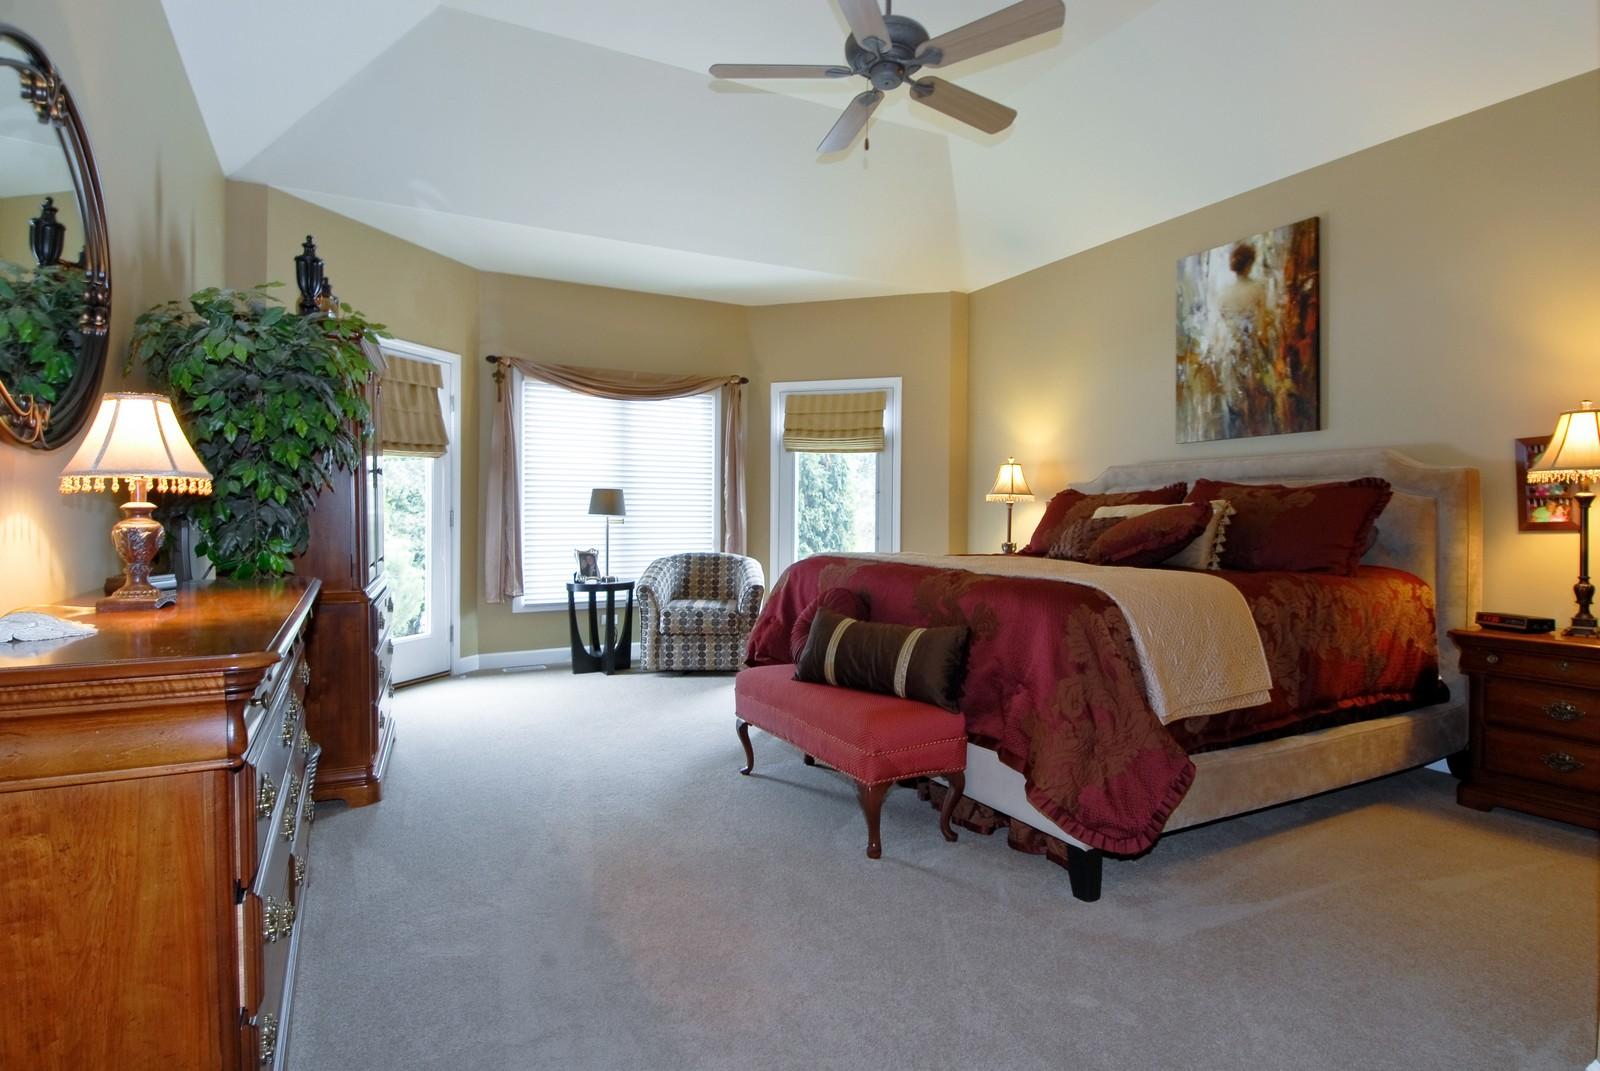 Real Estate Photography - 701 Ashton Ln, South Elgin, IL, 60177 - Master Bedroom